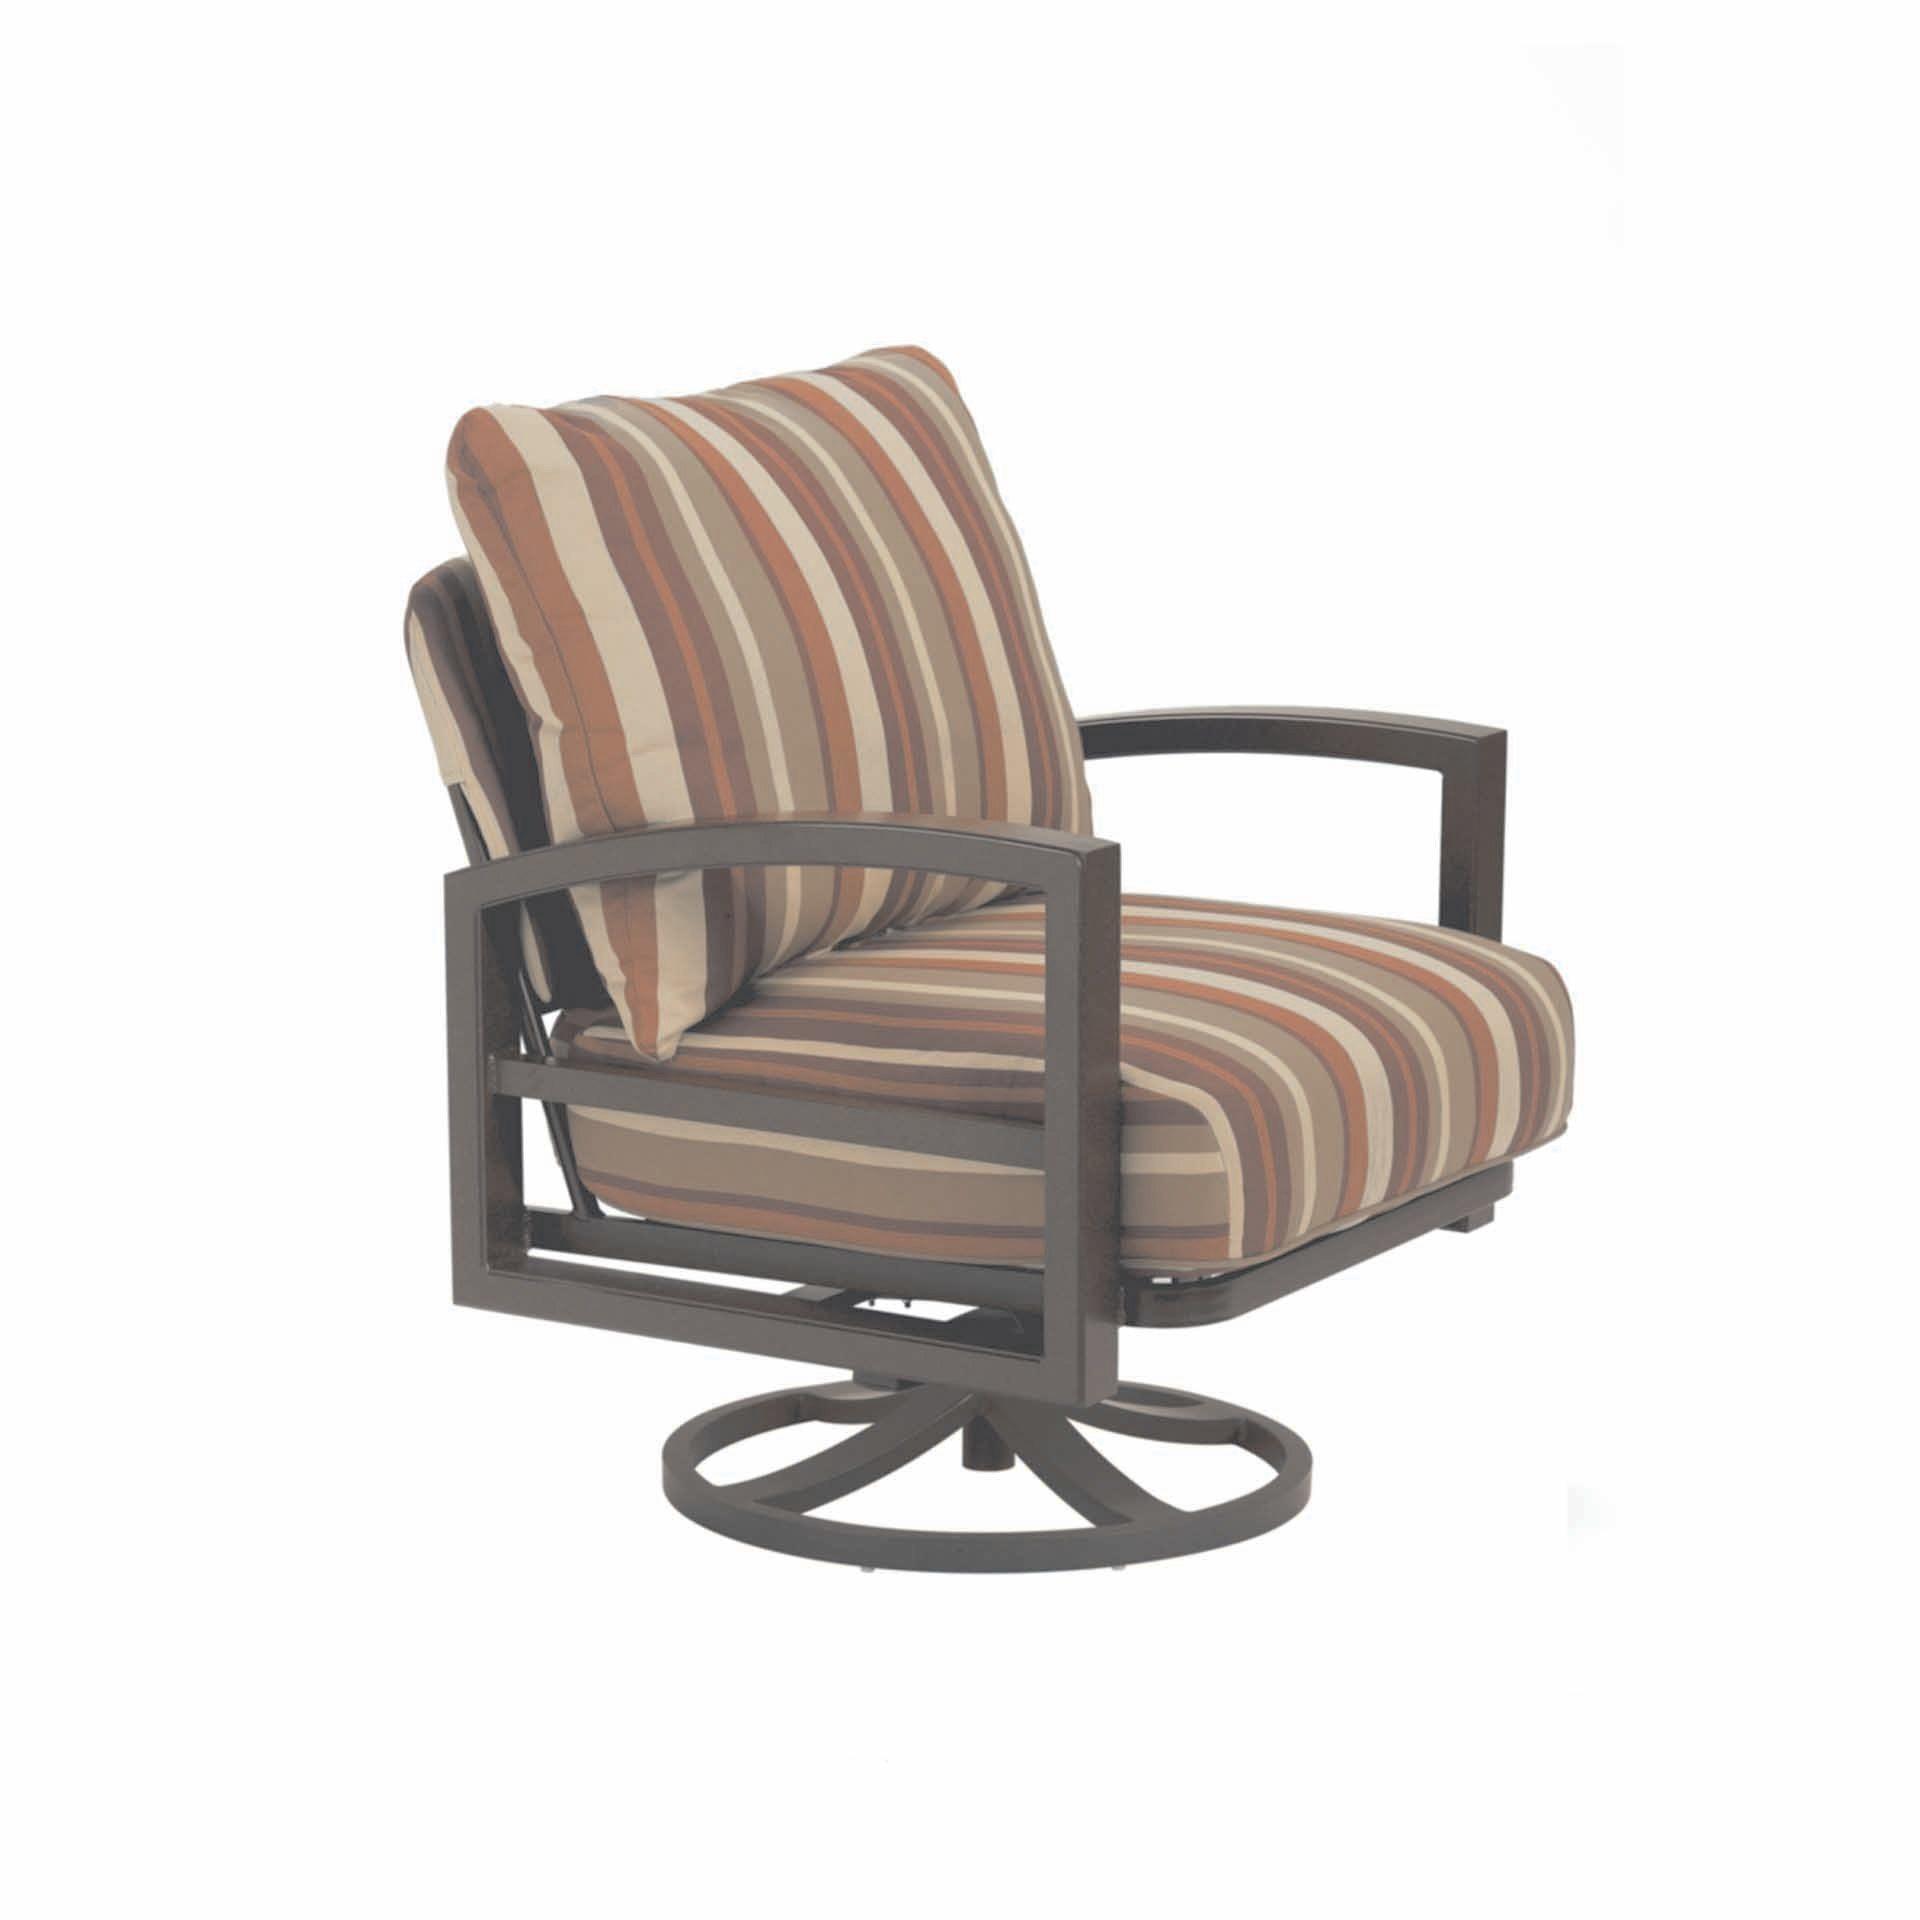 Tropitone Lakeside Cushion Swivel Action Lounger Leisure